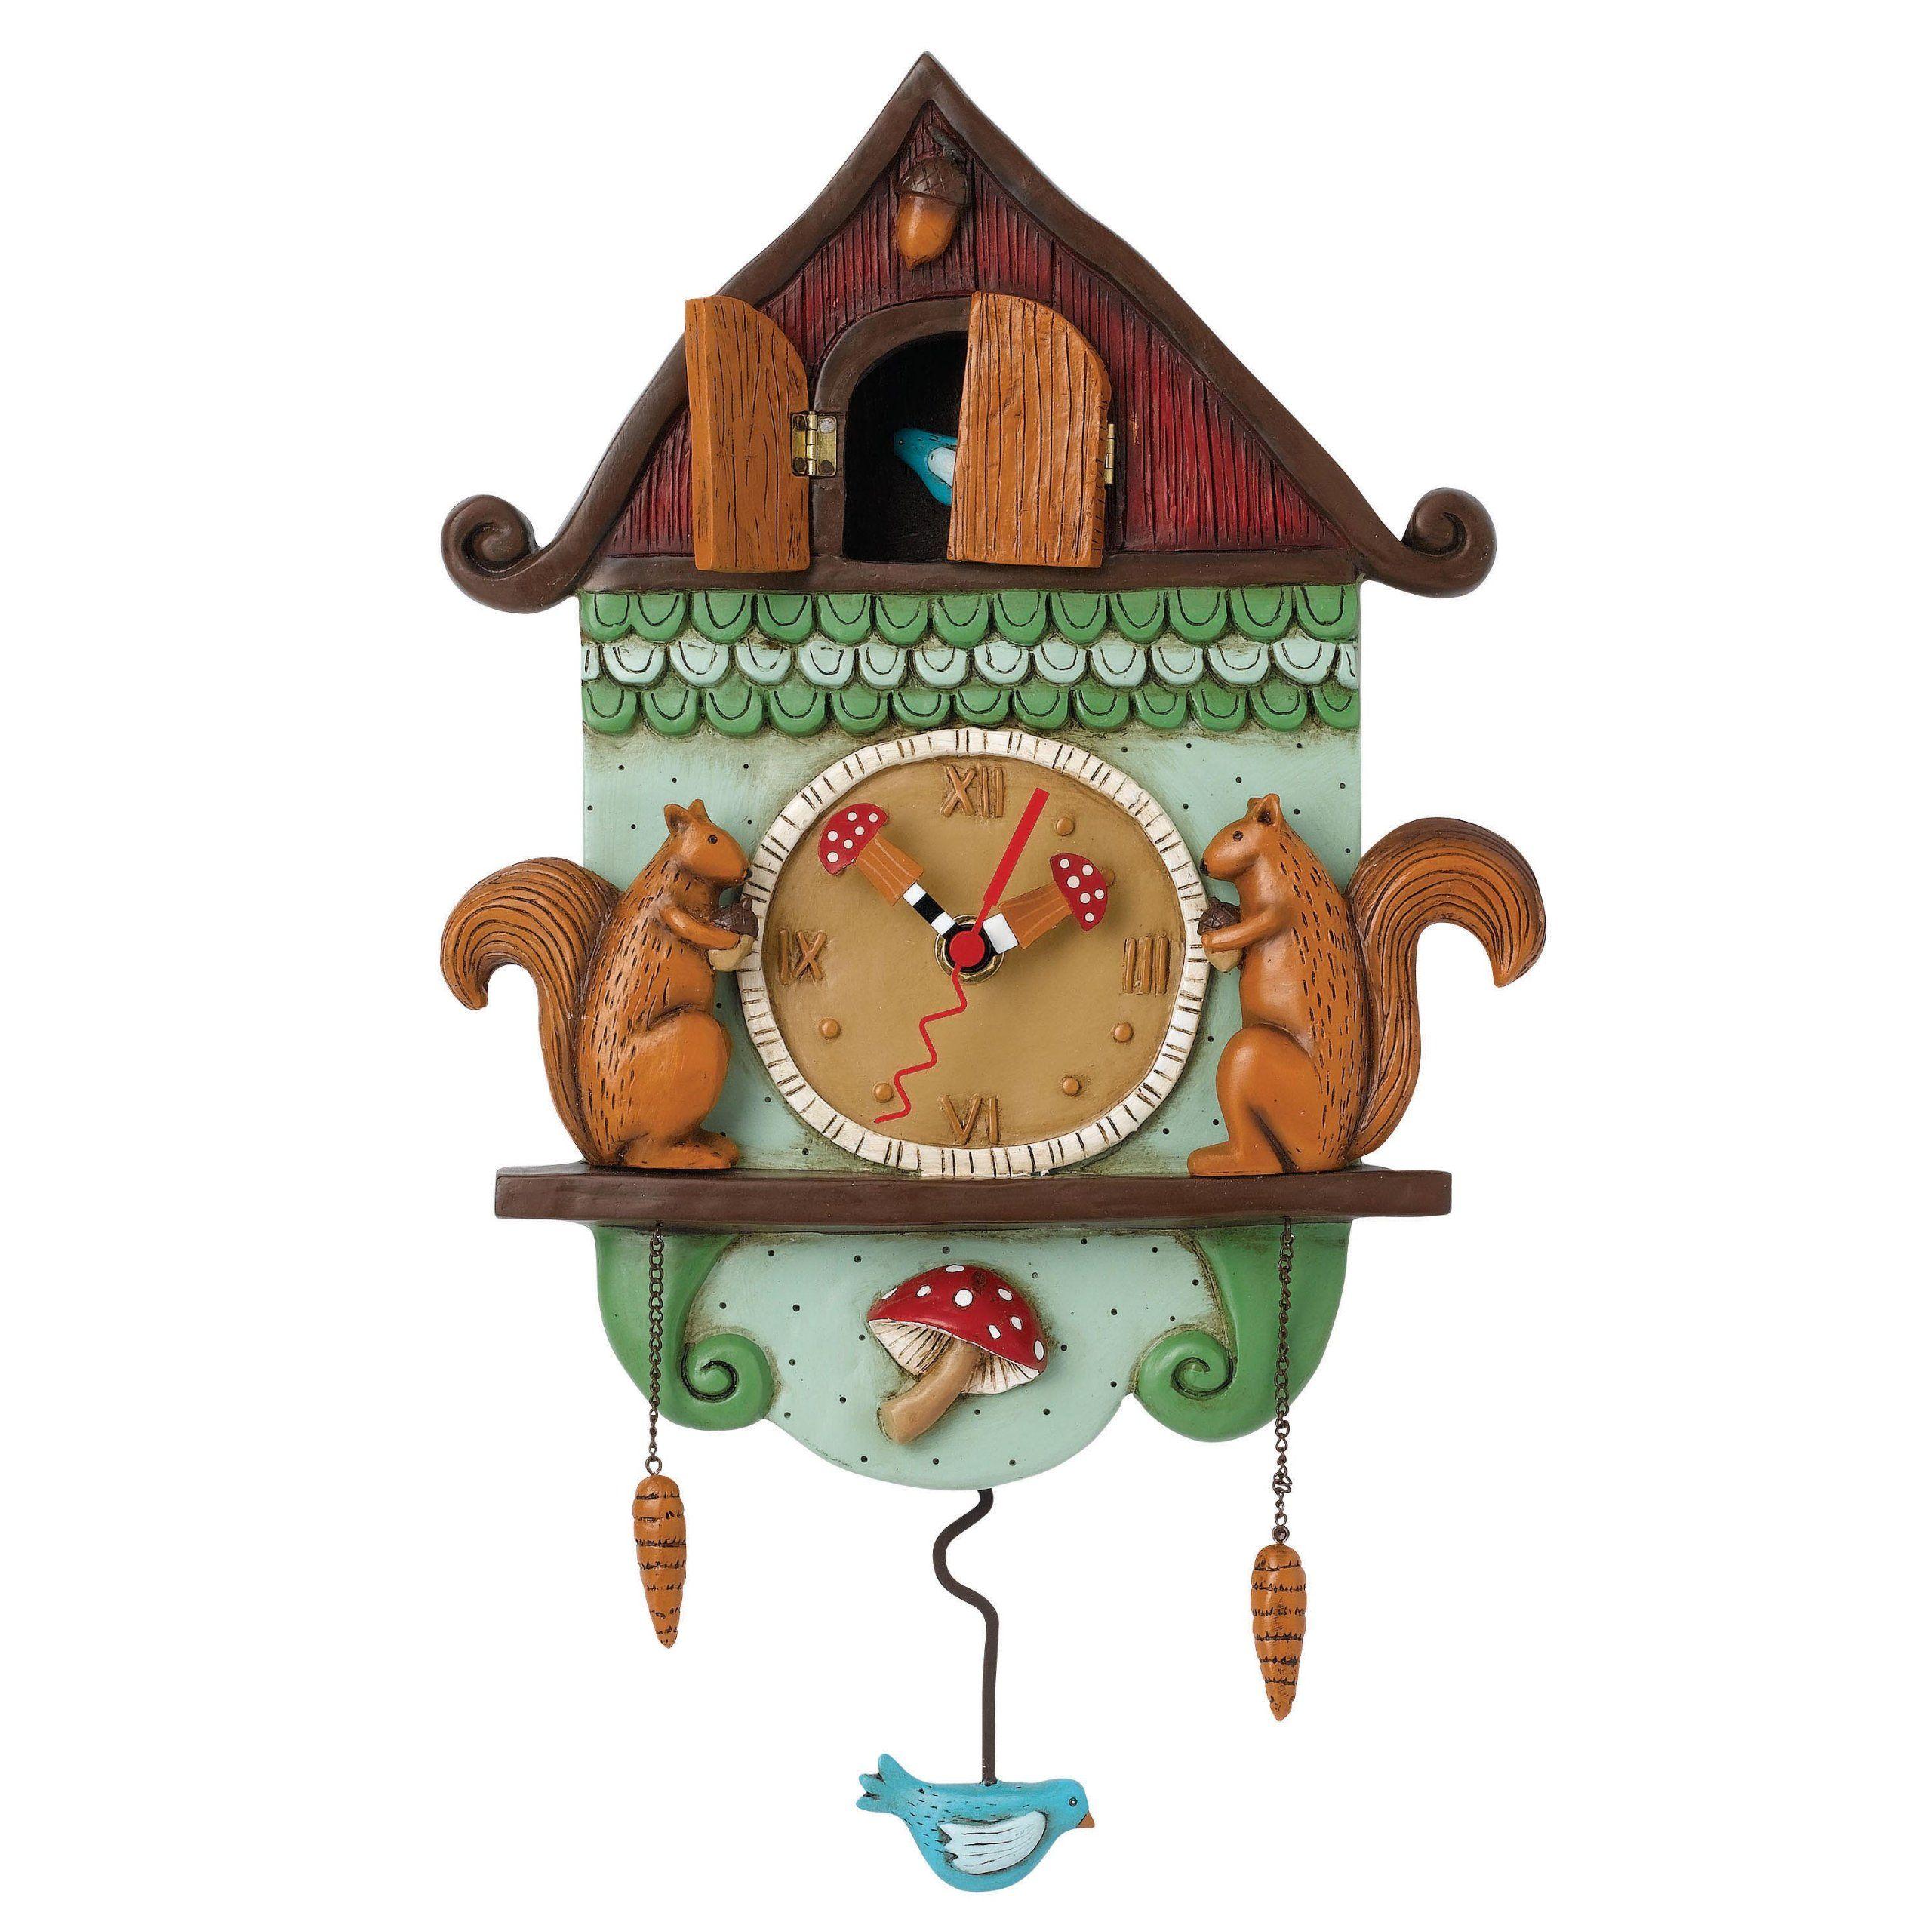 Amazon Com Allen Designs Cuckoo Bird Clock P1054 Clock Pendulum Whimsical Cuckoo Clock Pendulum Wall Clock Clock